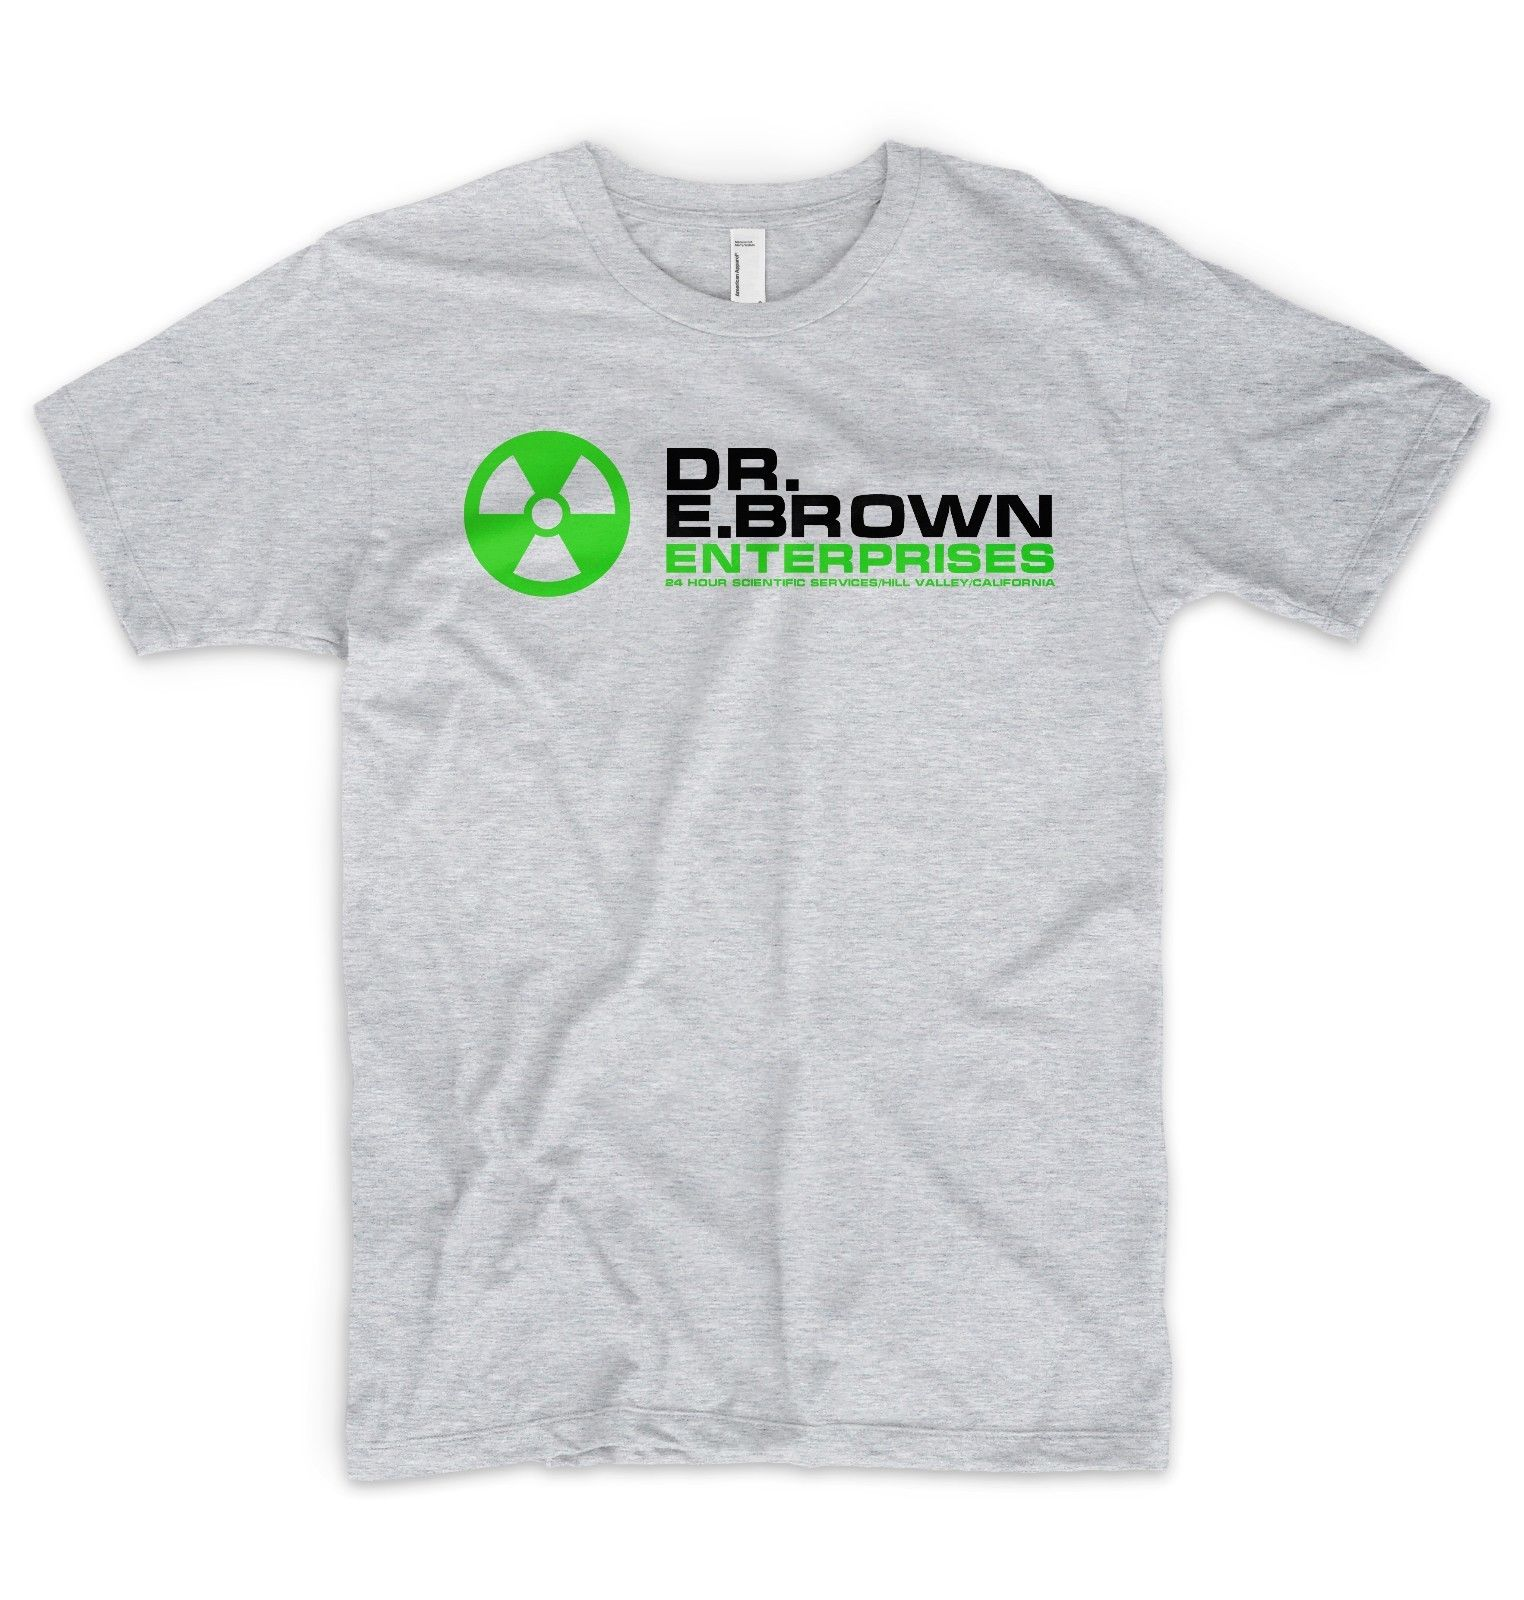 Dr EmmeBrown Enterprises T Shirt Logo Back To The Future Marty McFly Cool Casual pride t shirt men Unisex Fashion tshirt